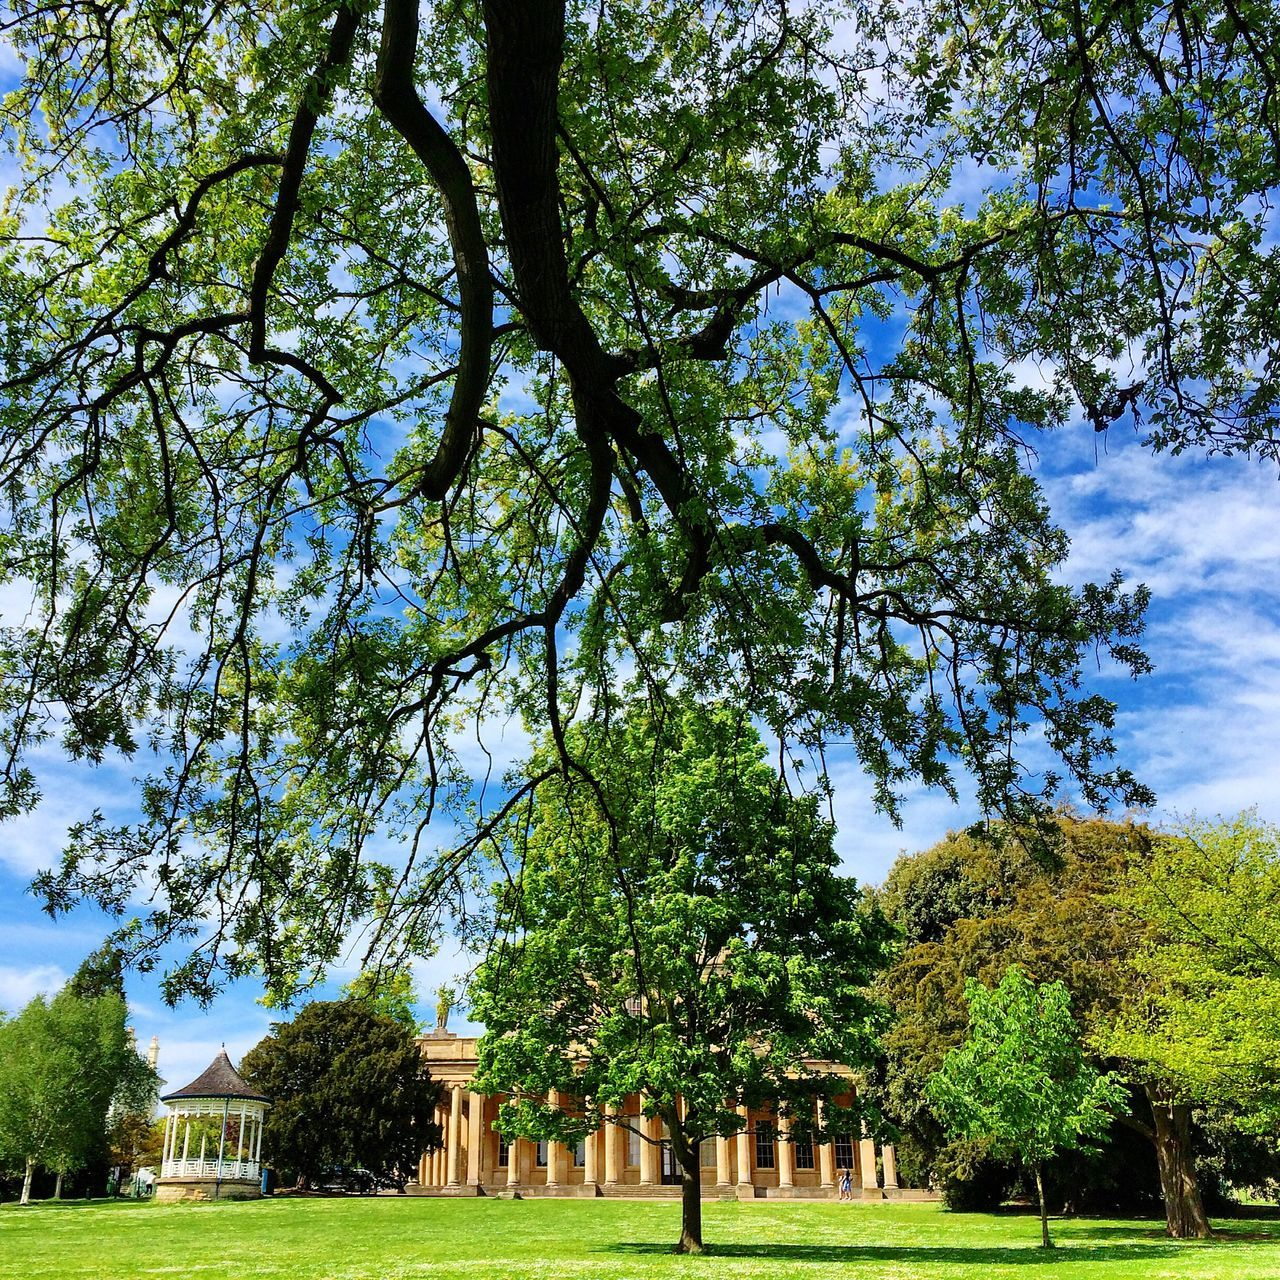 Cheltenham Pittville Park Garden Tree Nature Landscape Field Outdoor Green